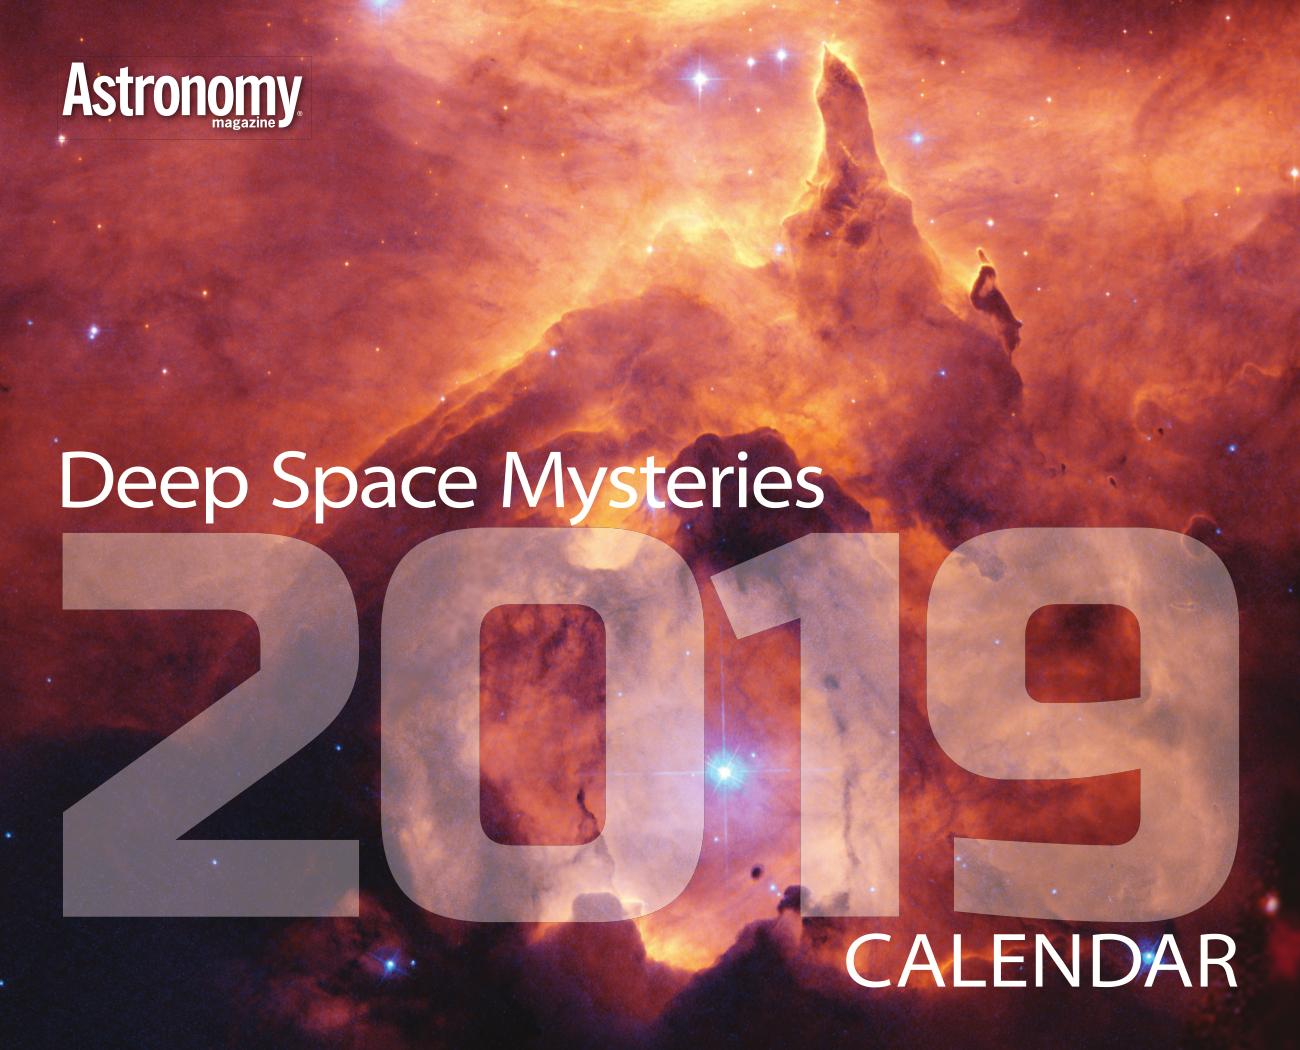 Tsto calendar christmas 2019 gift